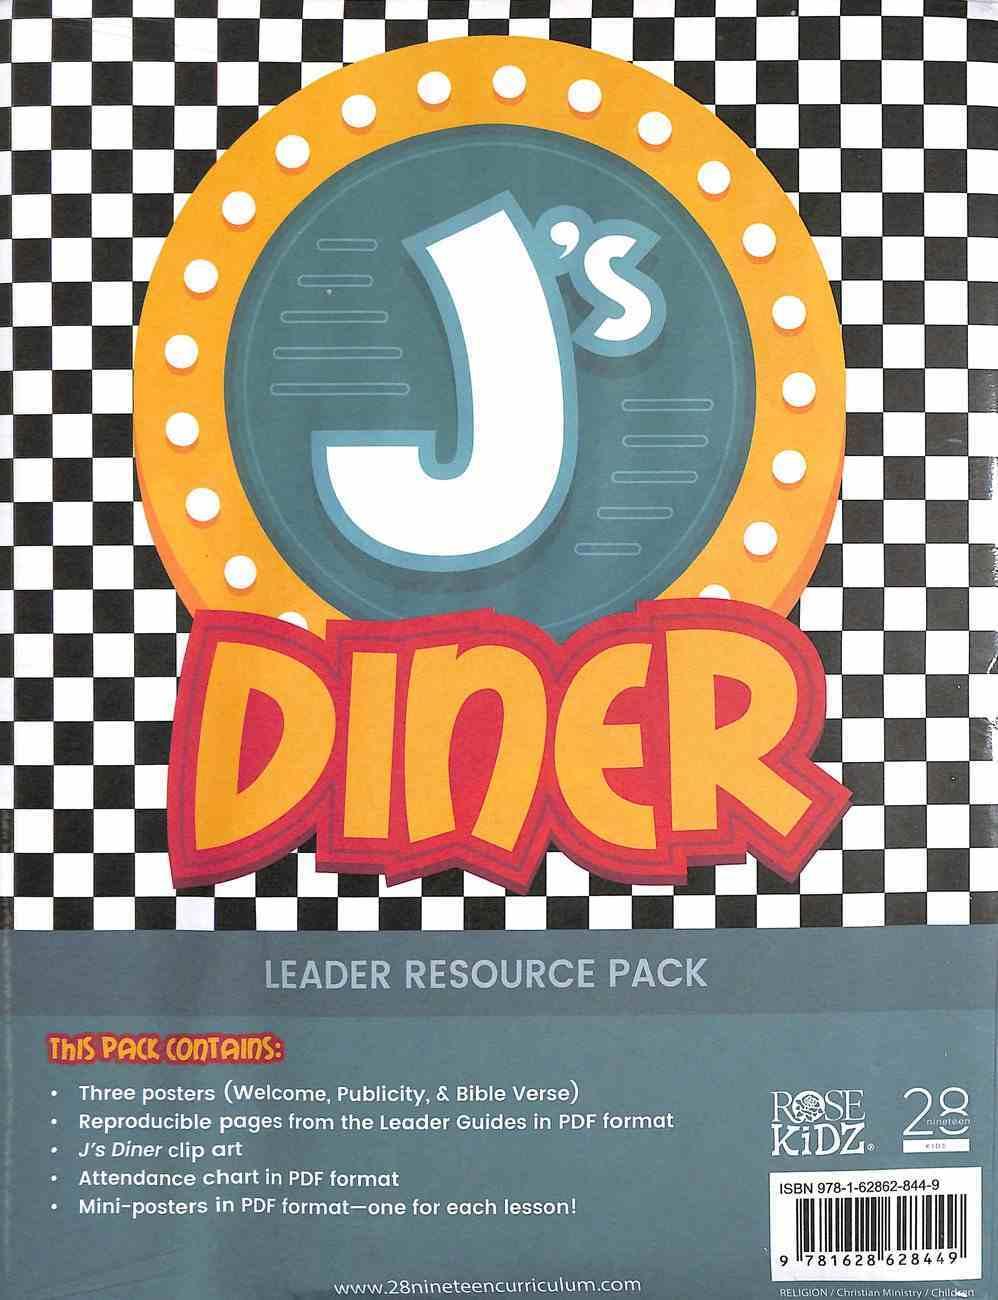 Leader Resource Pack (J's Diner Series) Pack